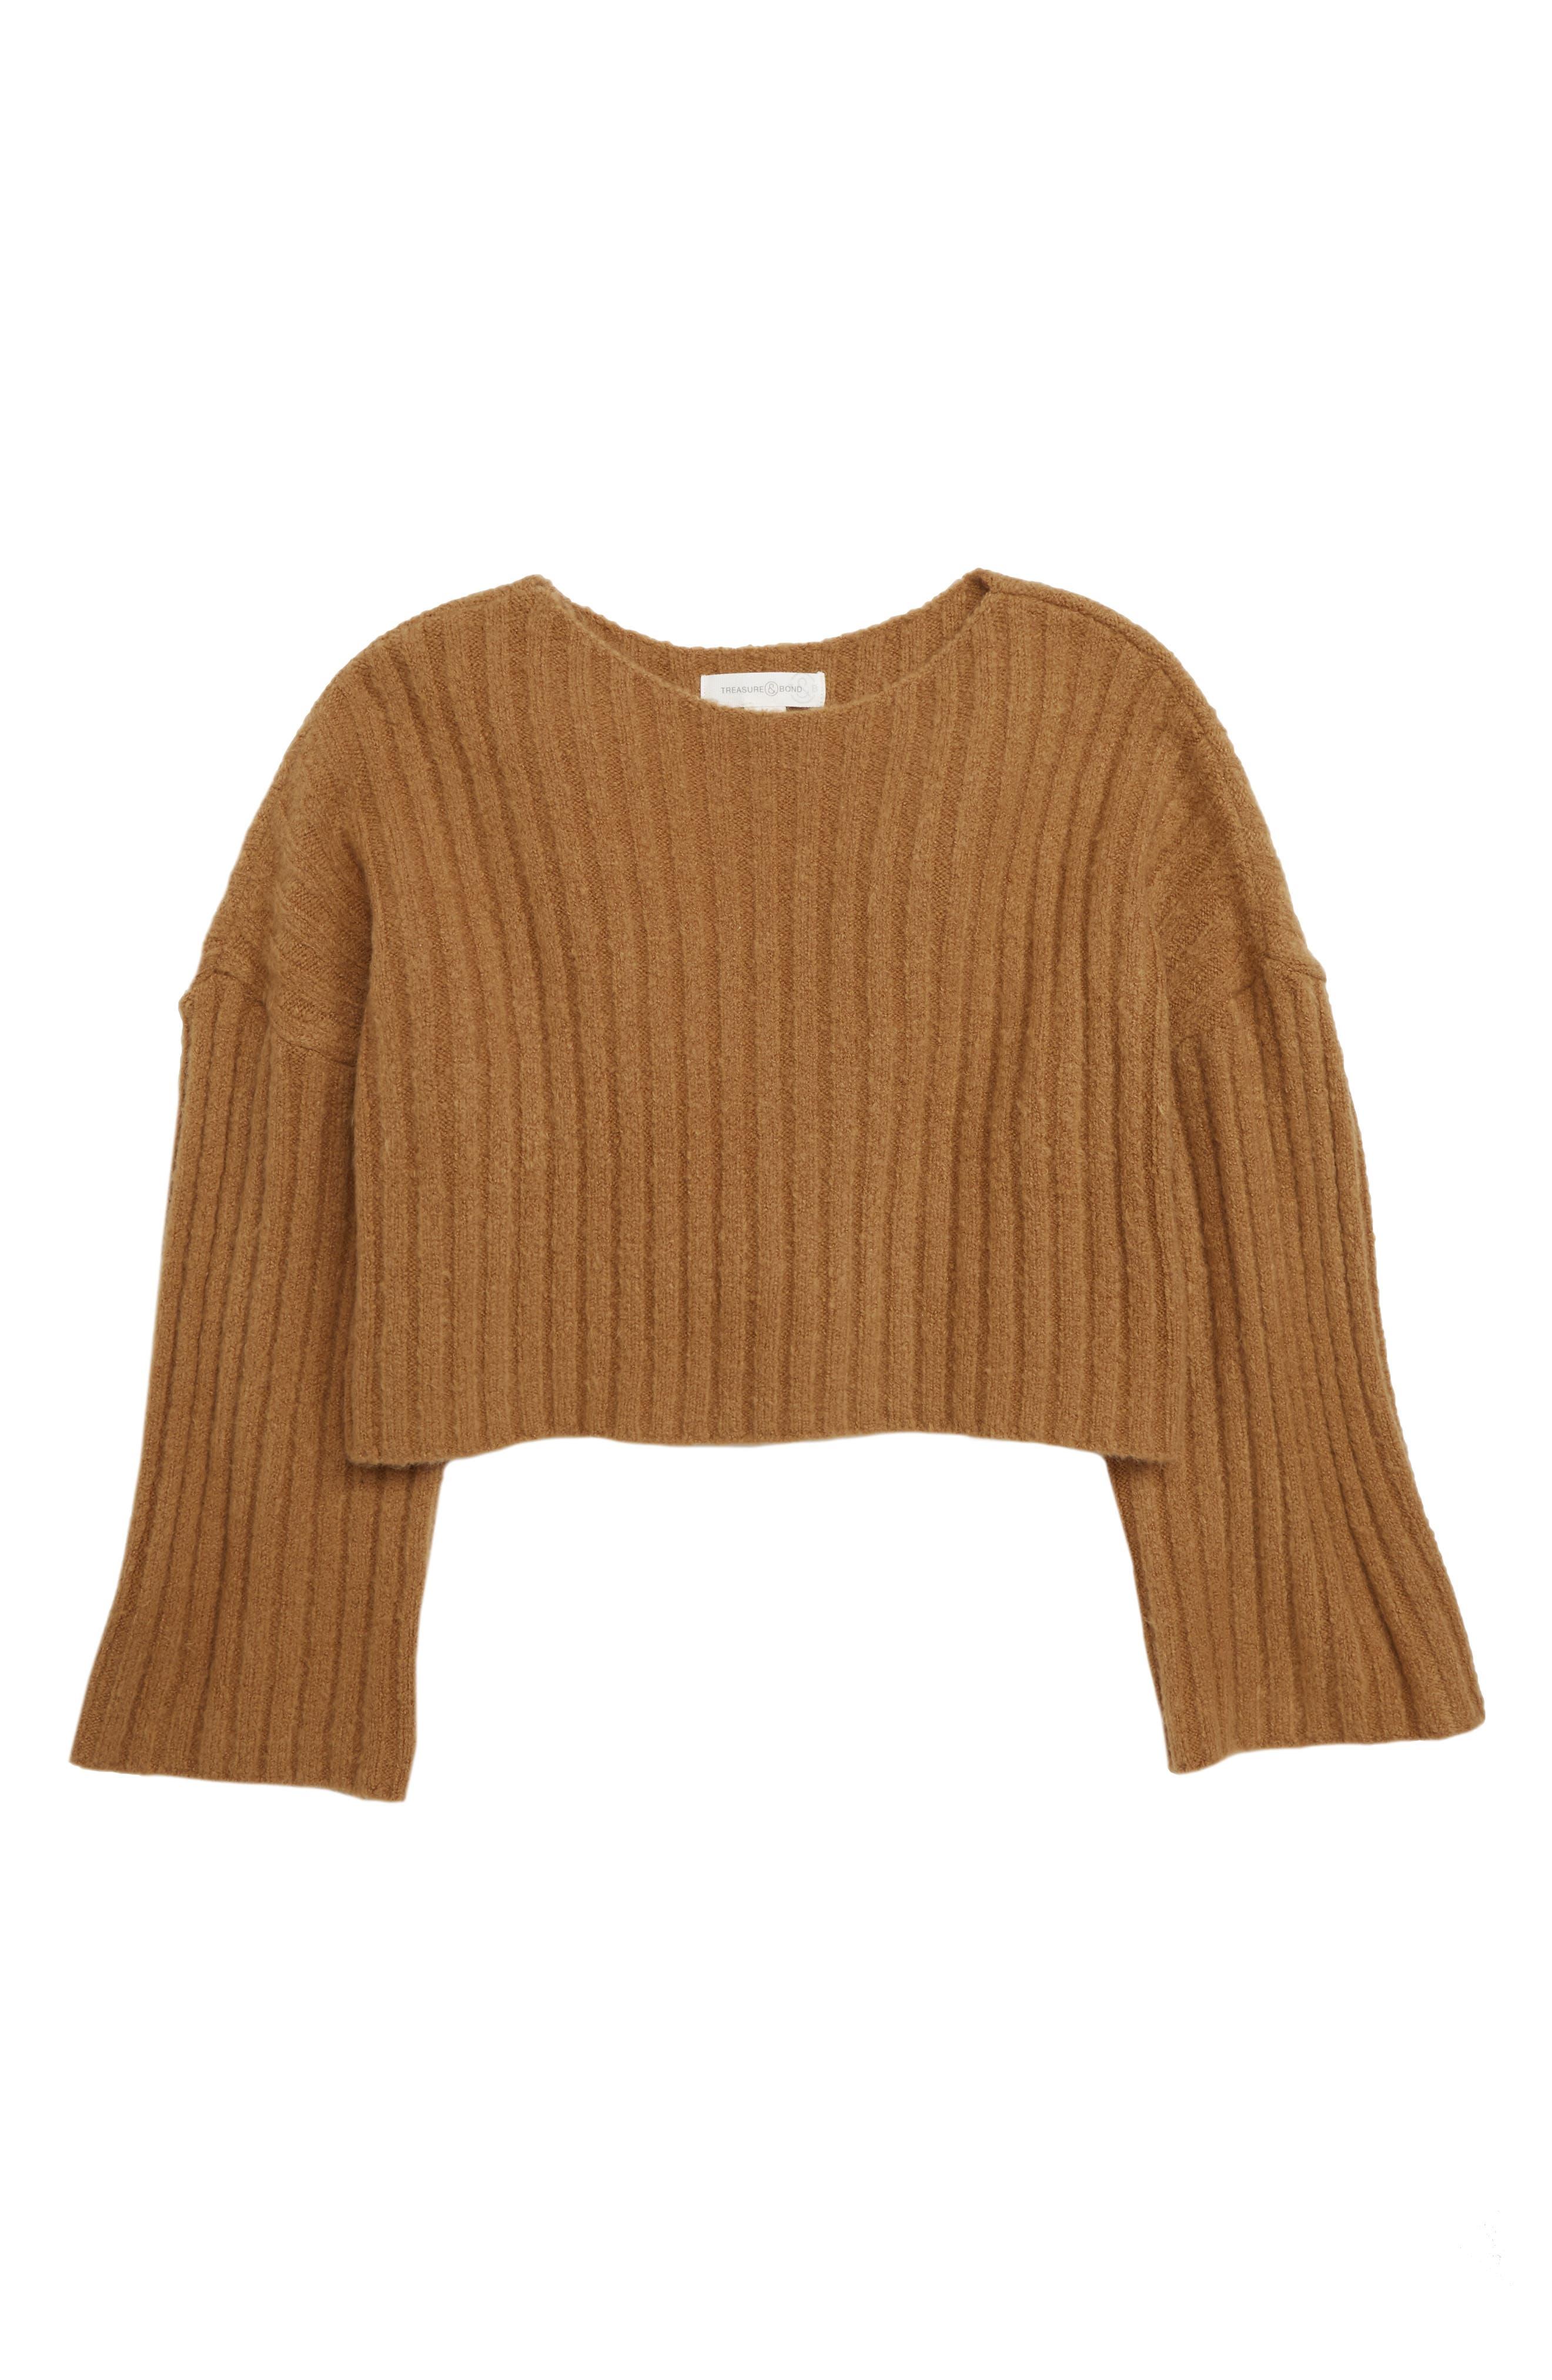 Crop Sweater,                             Main thumbnail 1, color,                             BROWN DIJON